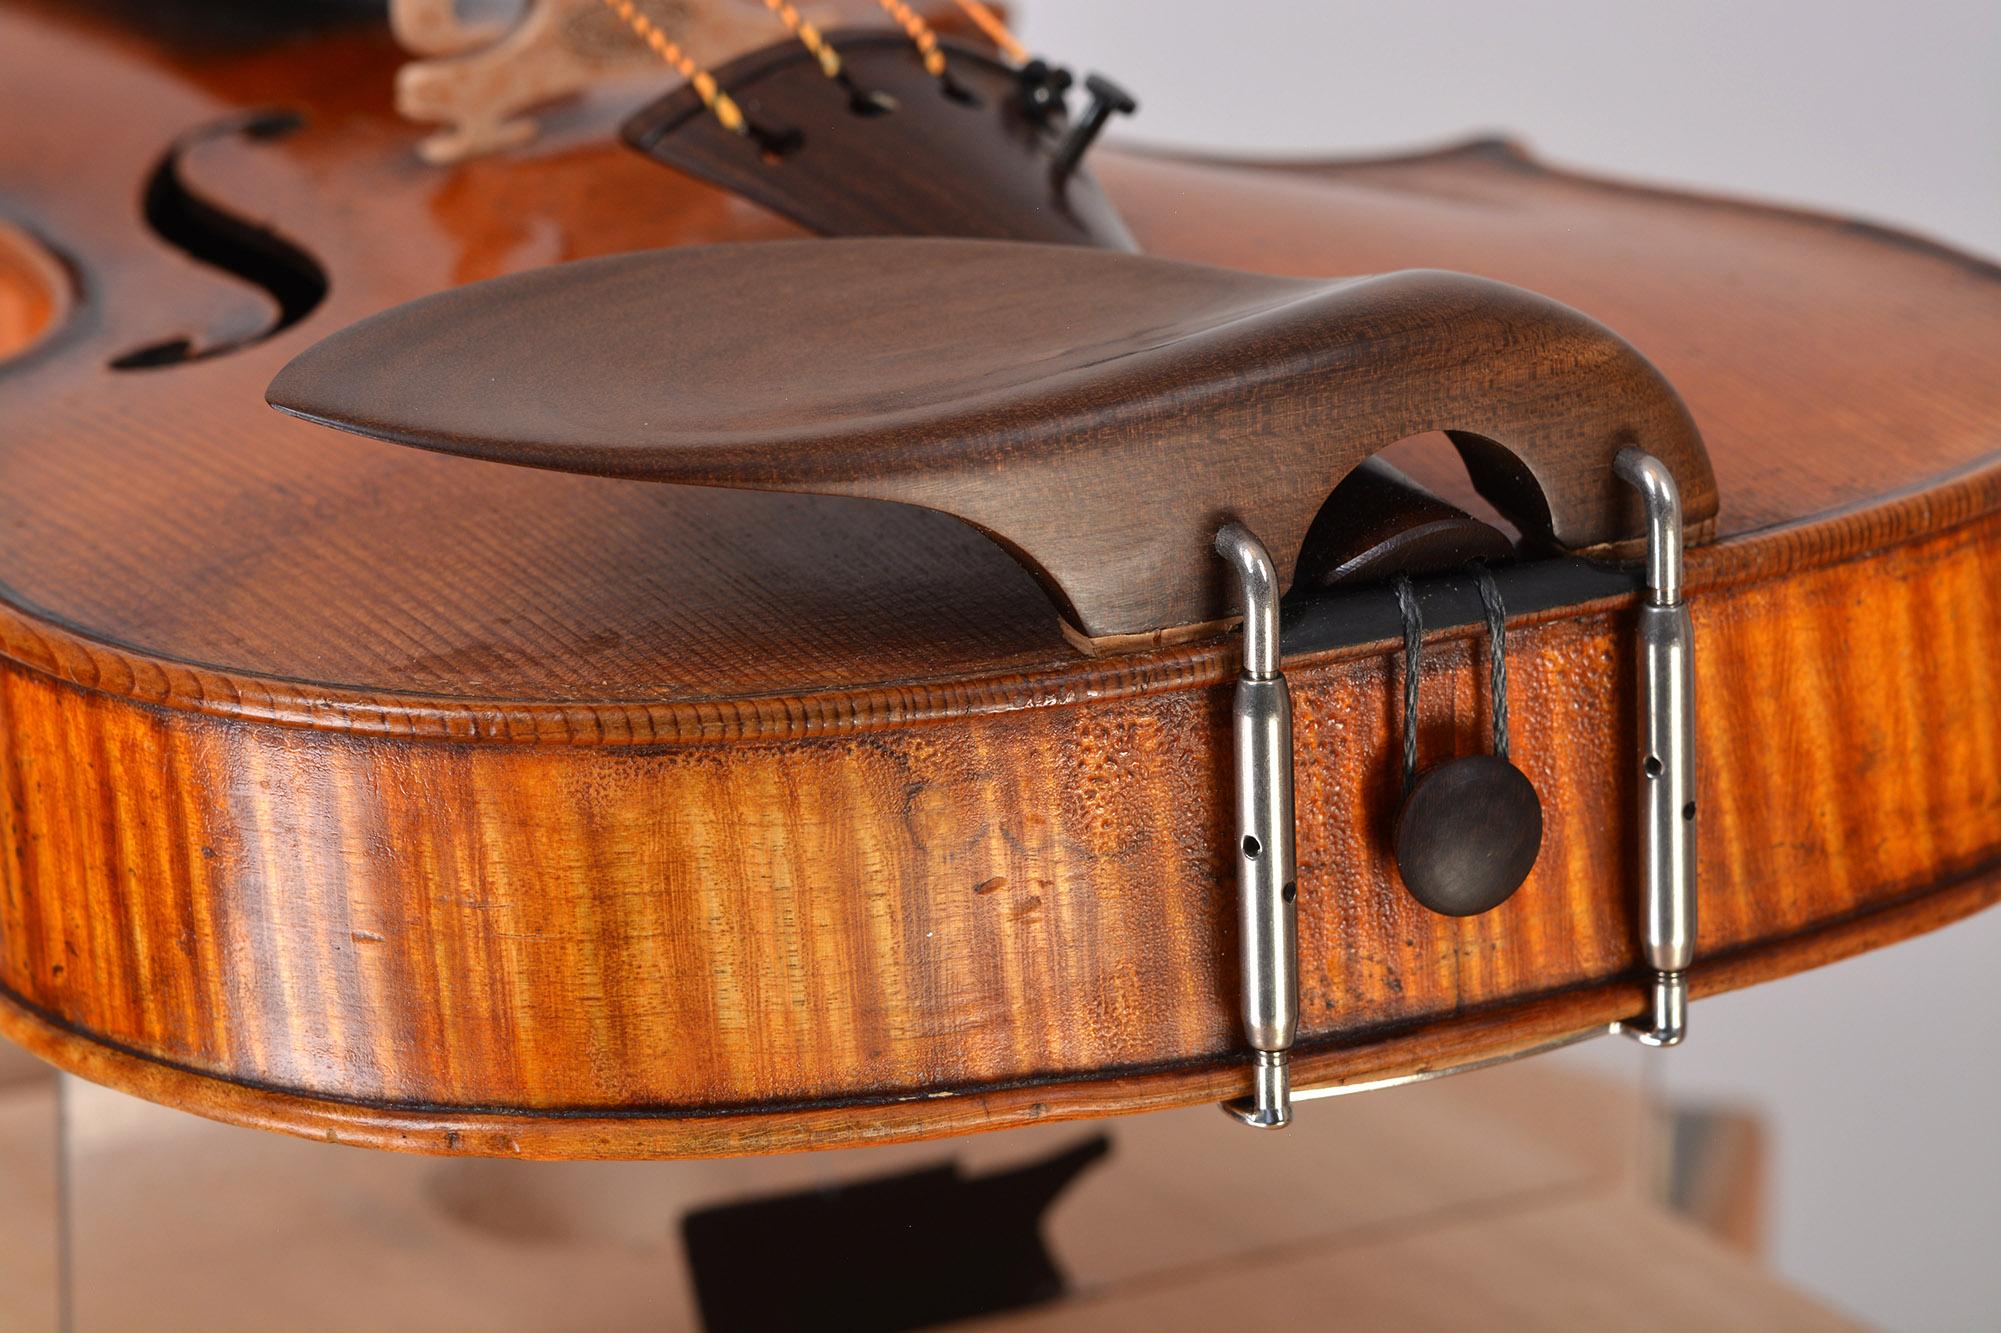 Endbutton from Sonowood maple made by Wilhelm Geigenbau